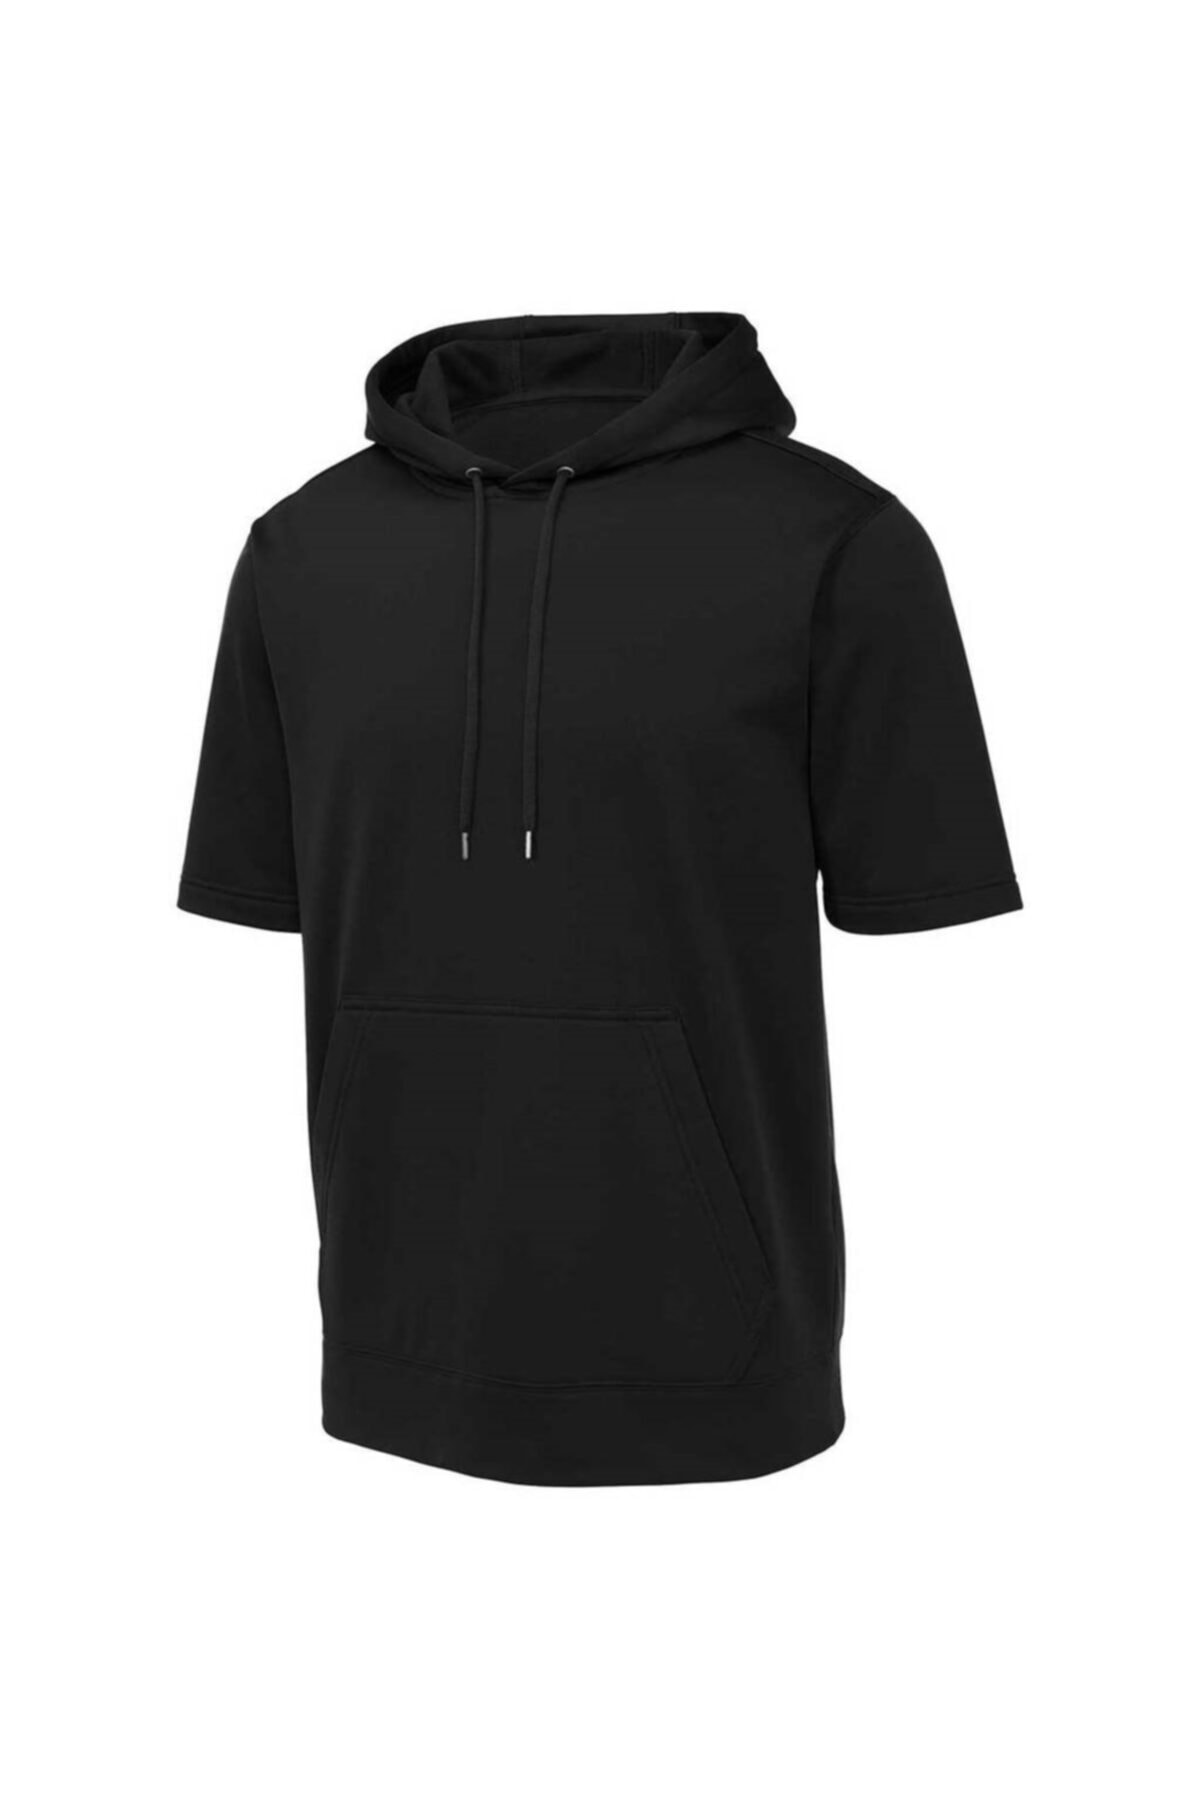 Unisex Siyah Kapüşonlu Kanguru Cepli Kısa Kollu Half Sweatshirt